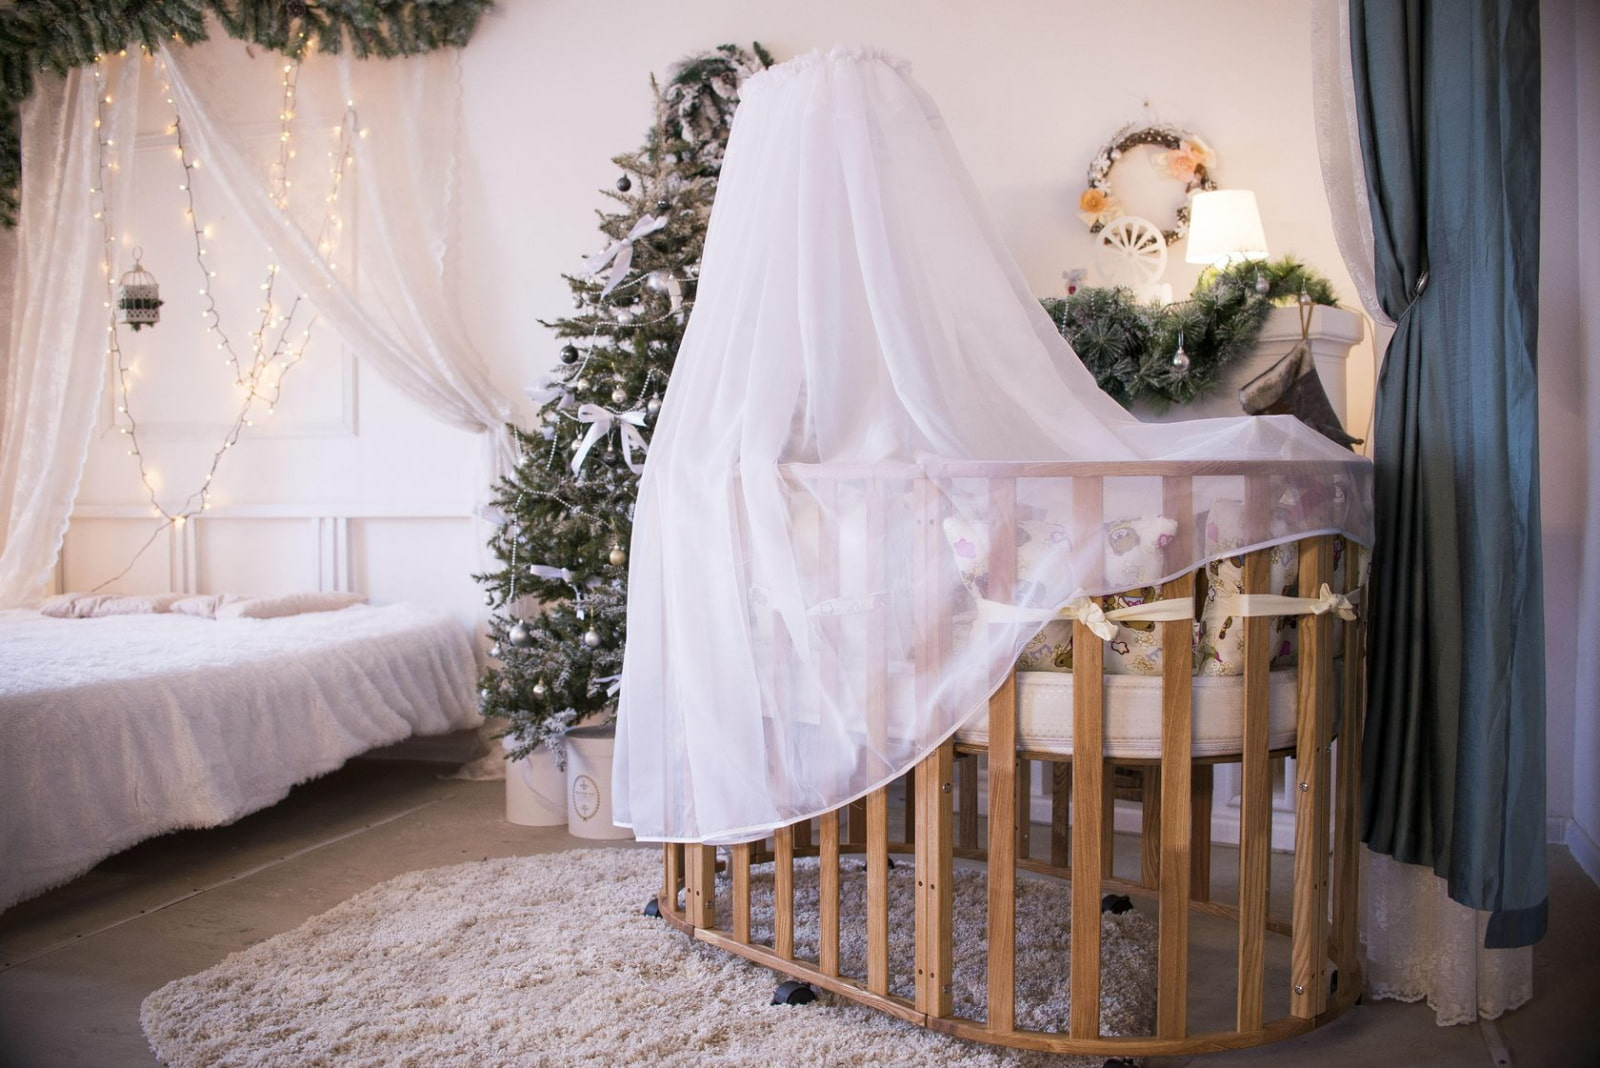 балдахин над кроватью для новорожденного